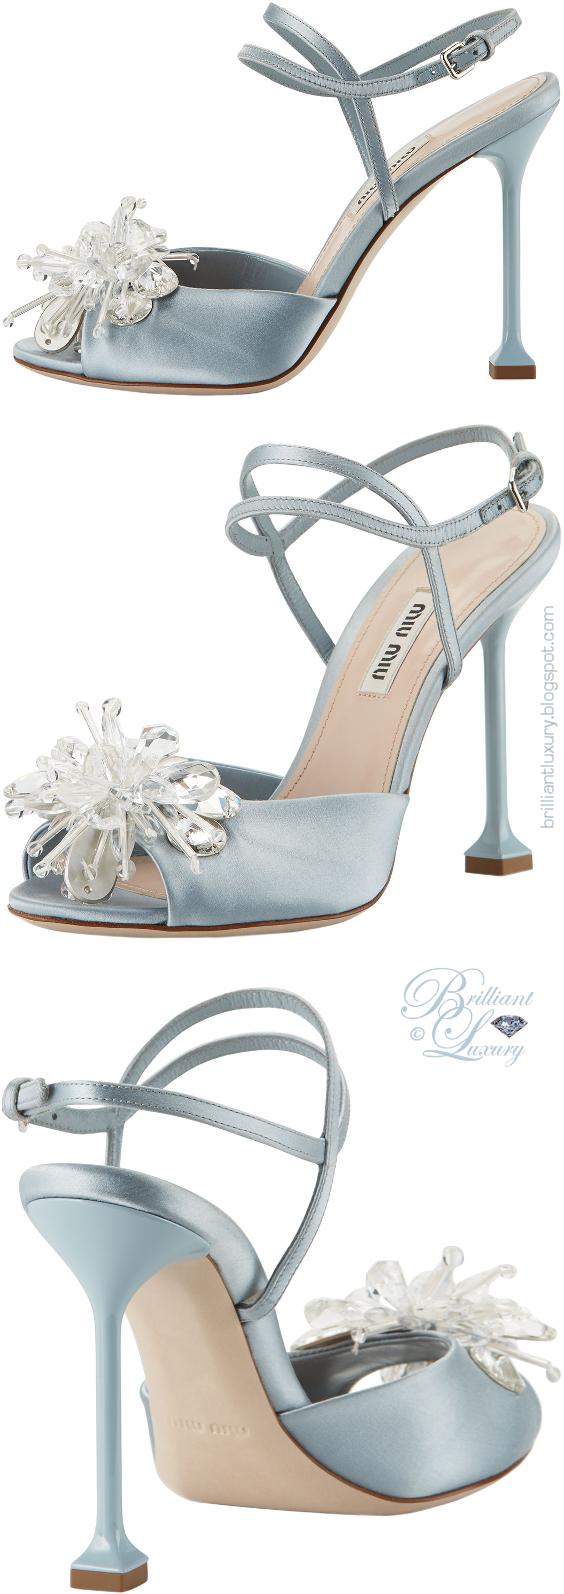 Brilliant Luxury ♦ Miu Miu blue crystal-embellished sandals